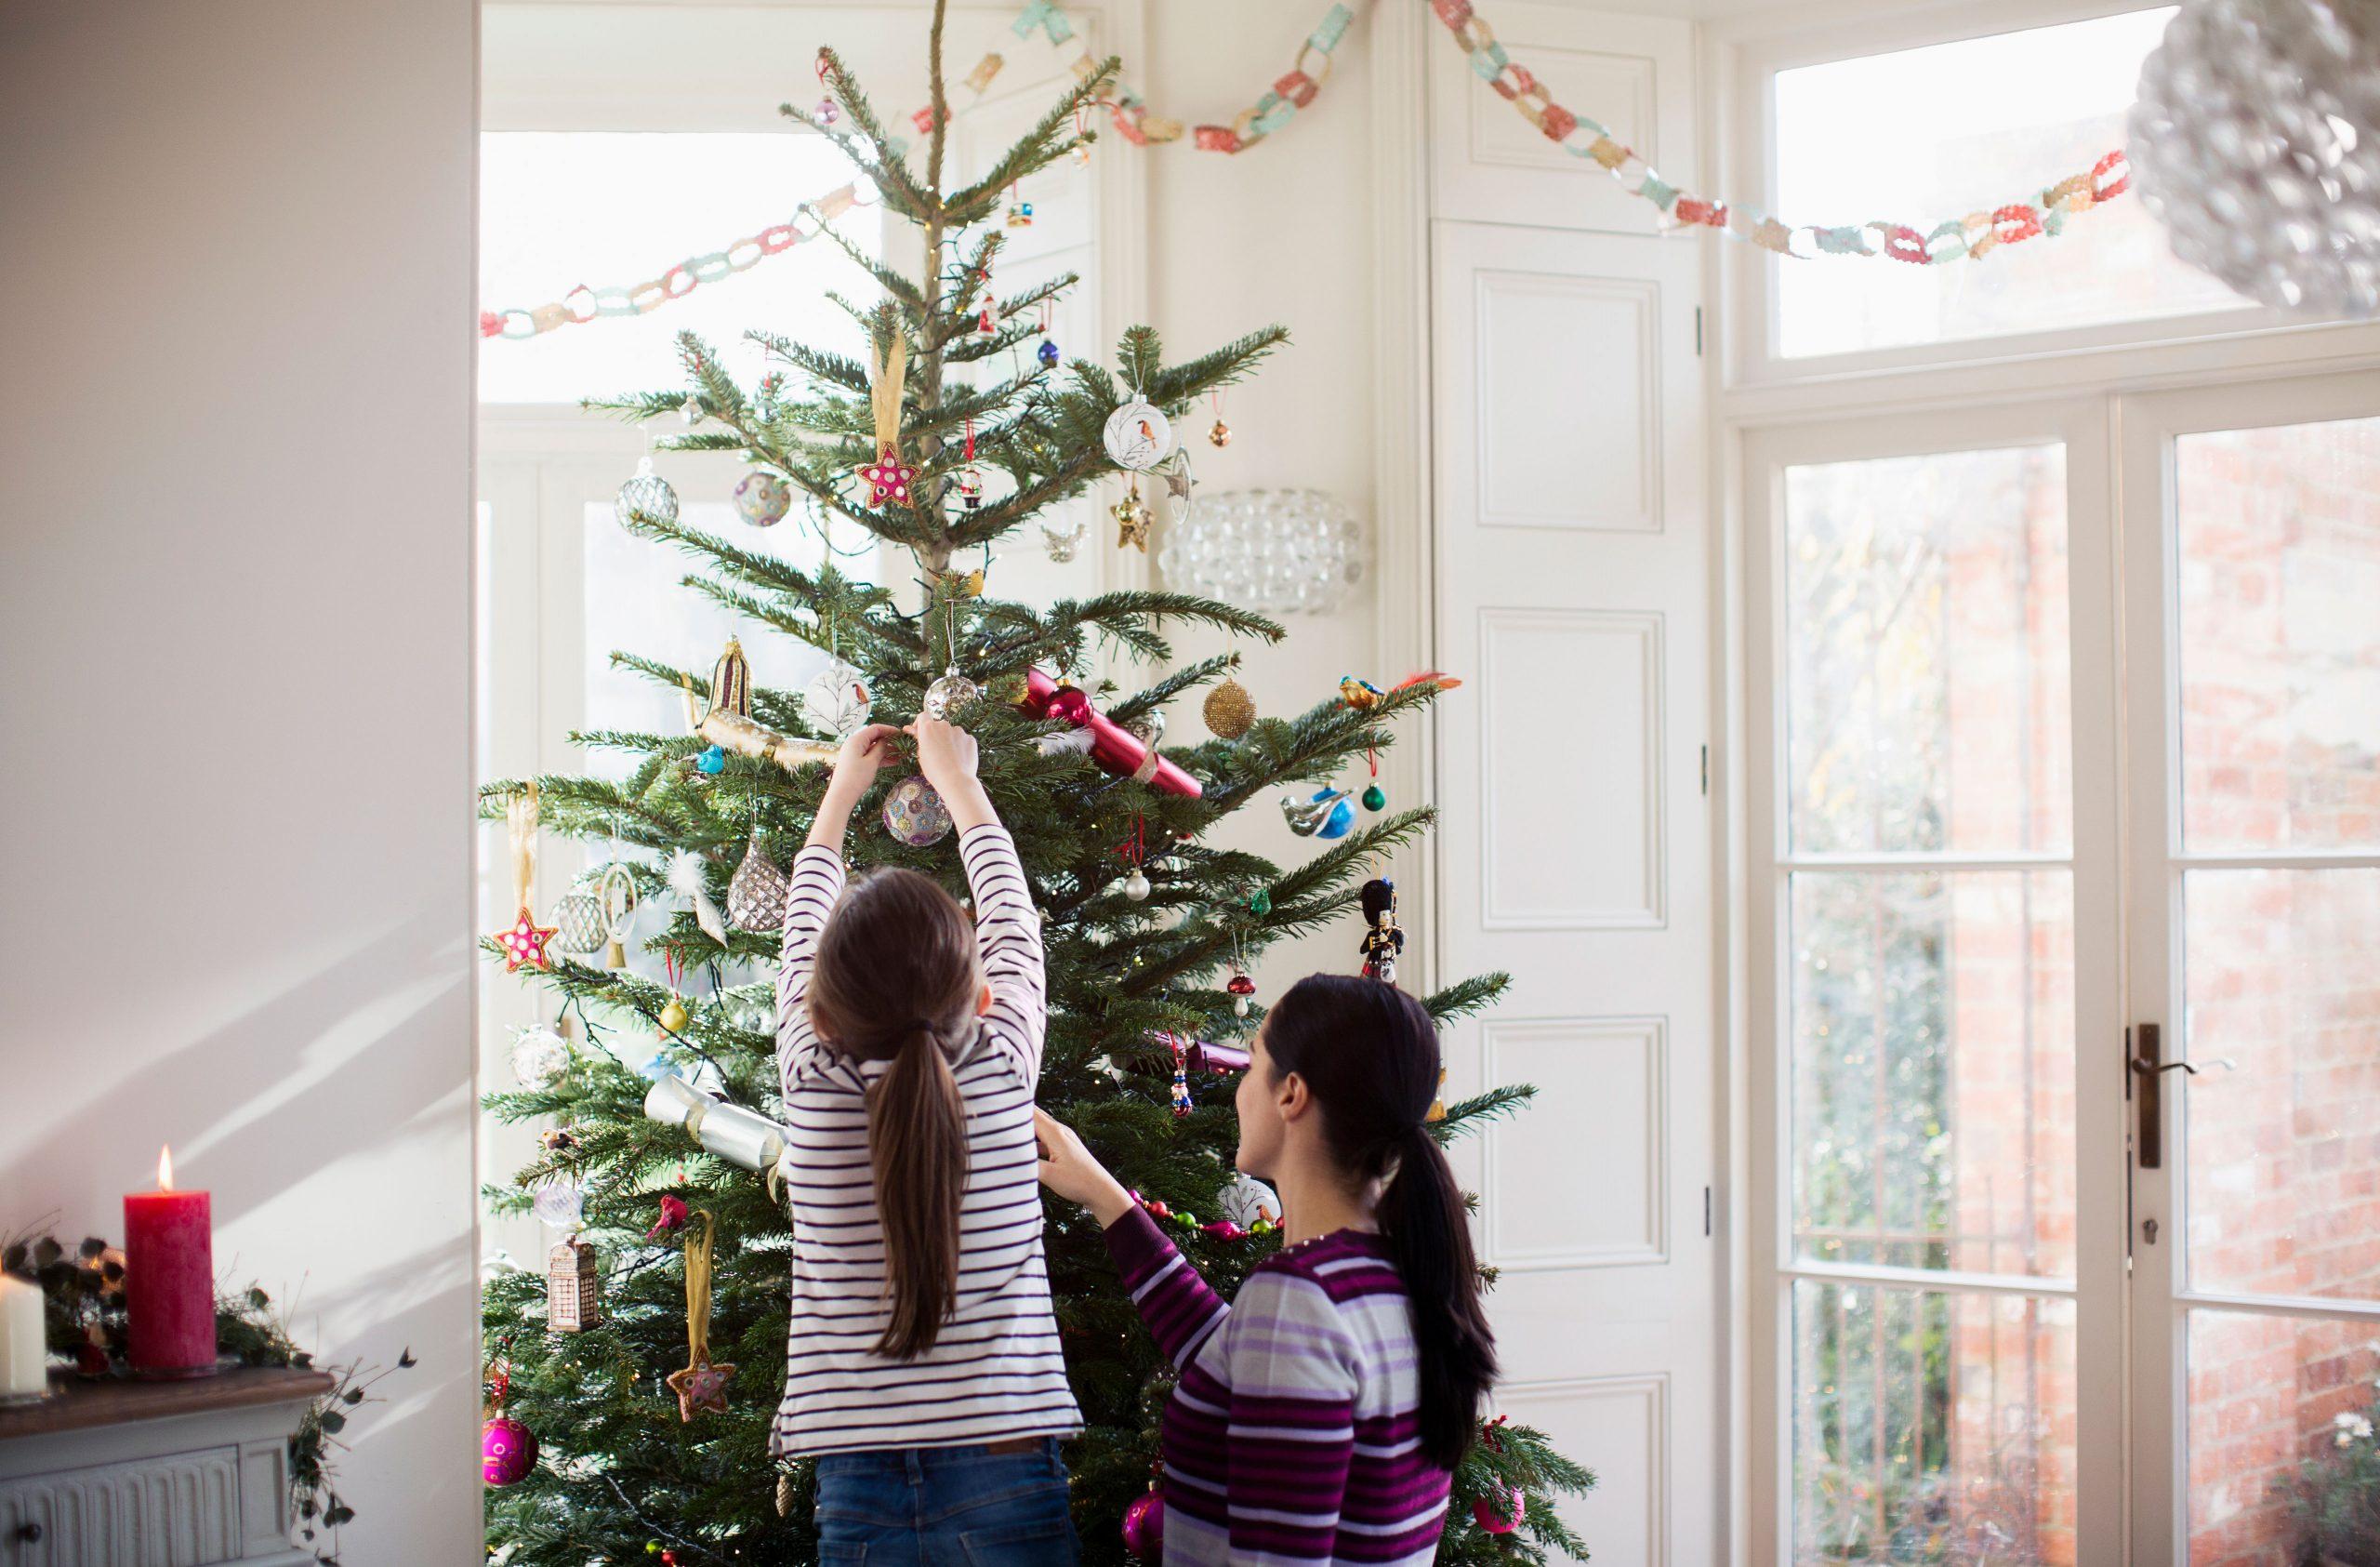 Lidl Christmas trees